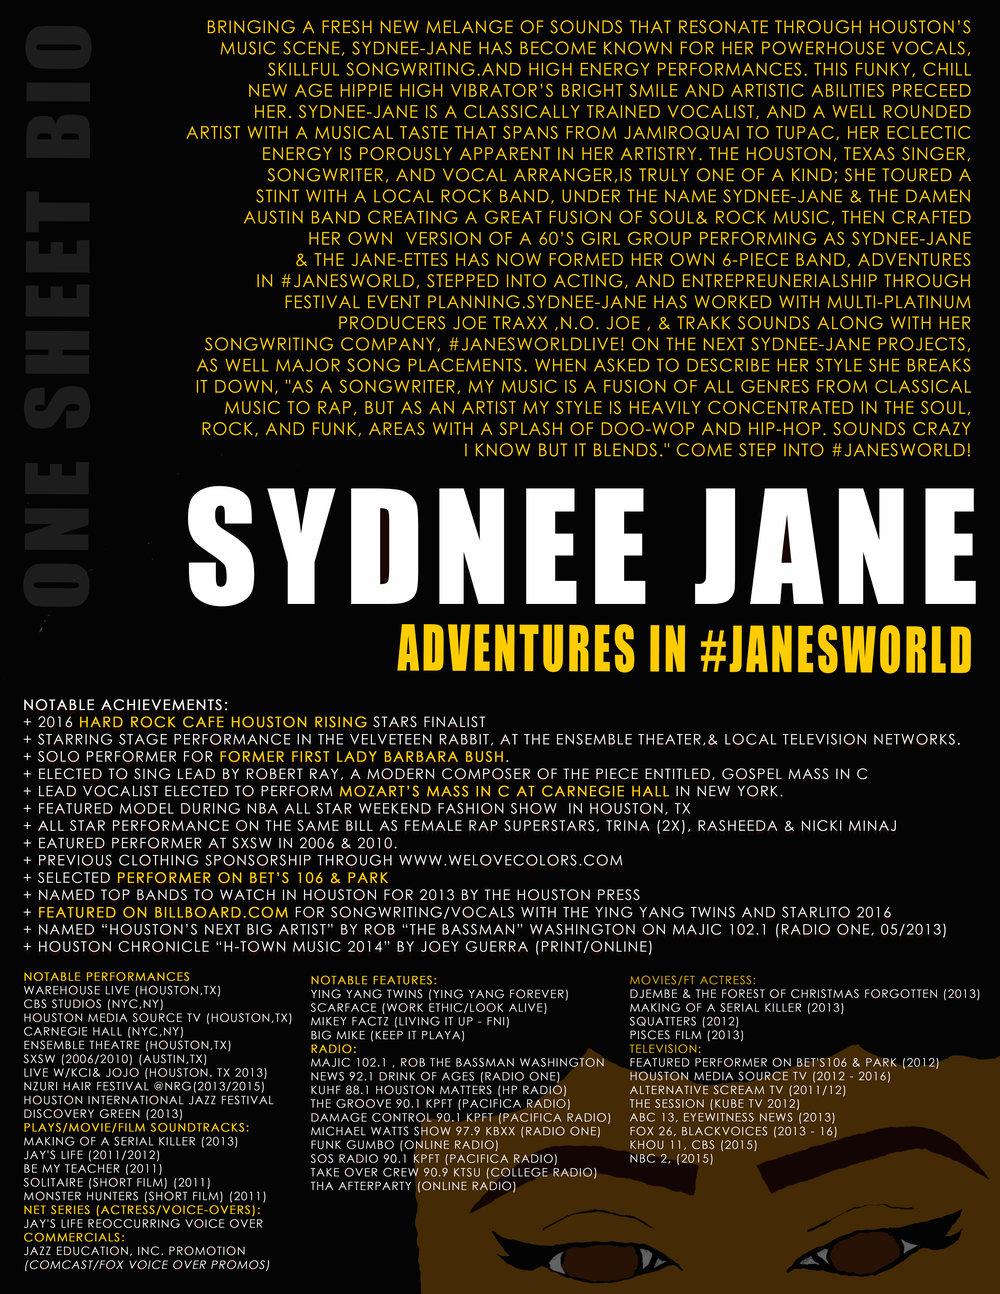 sydnee jane one sheet 2016.jpg